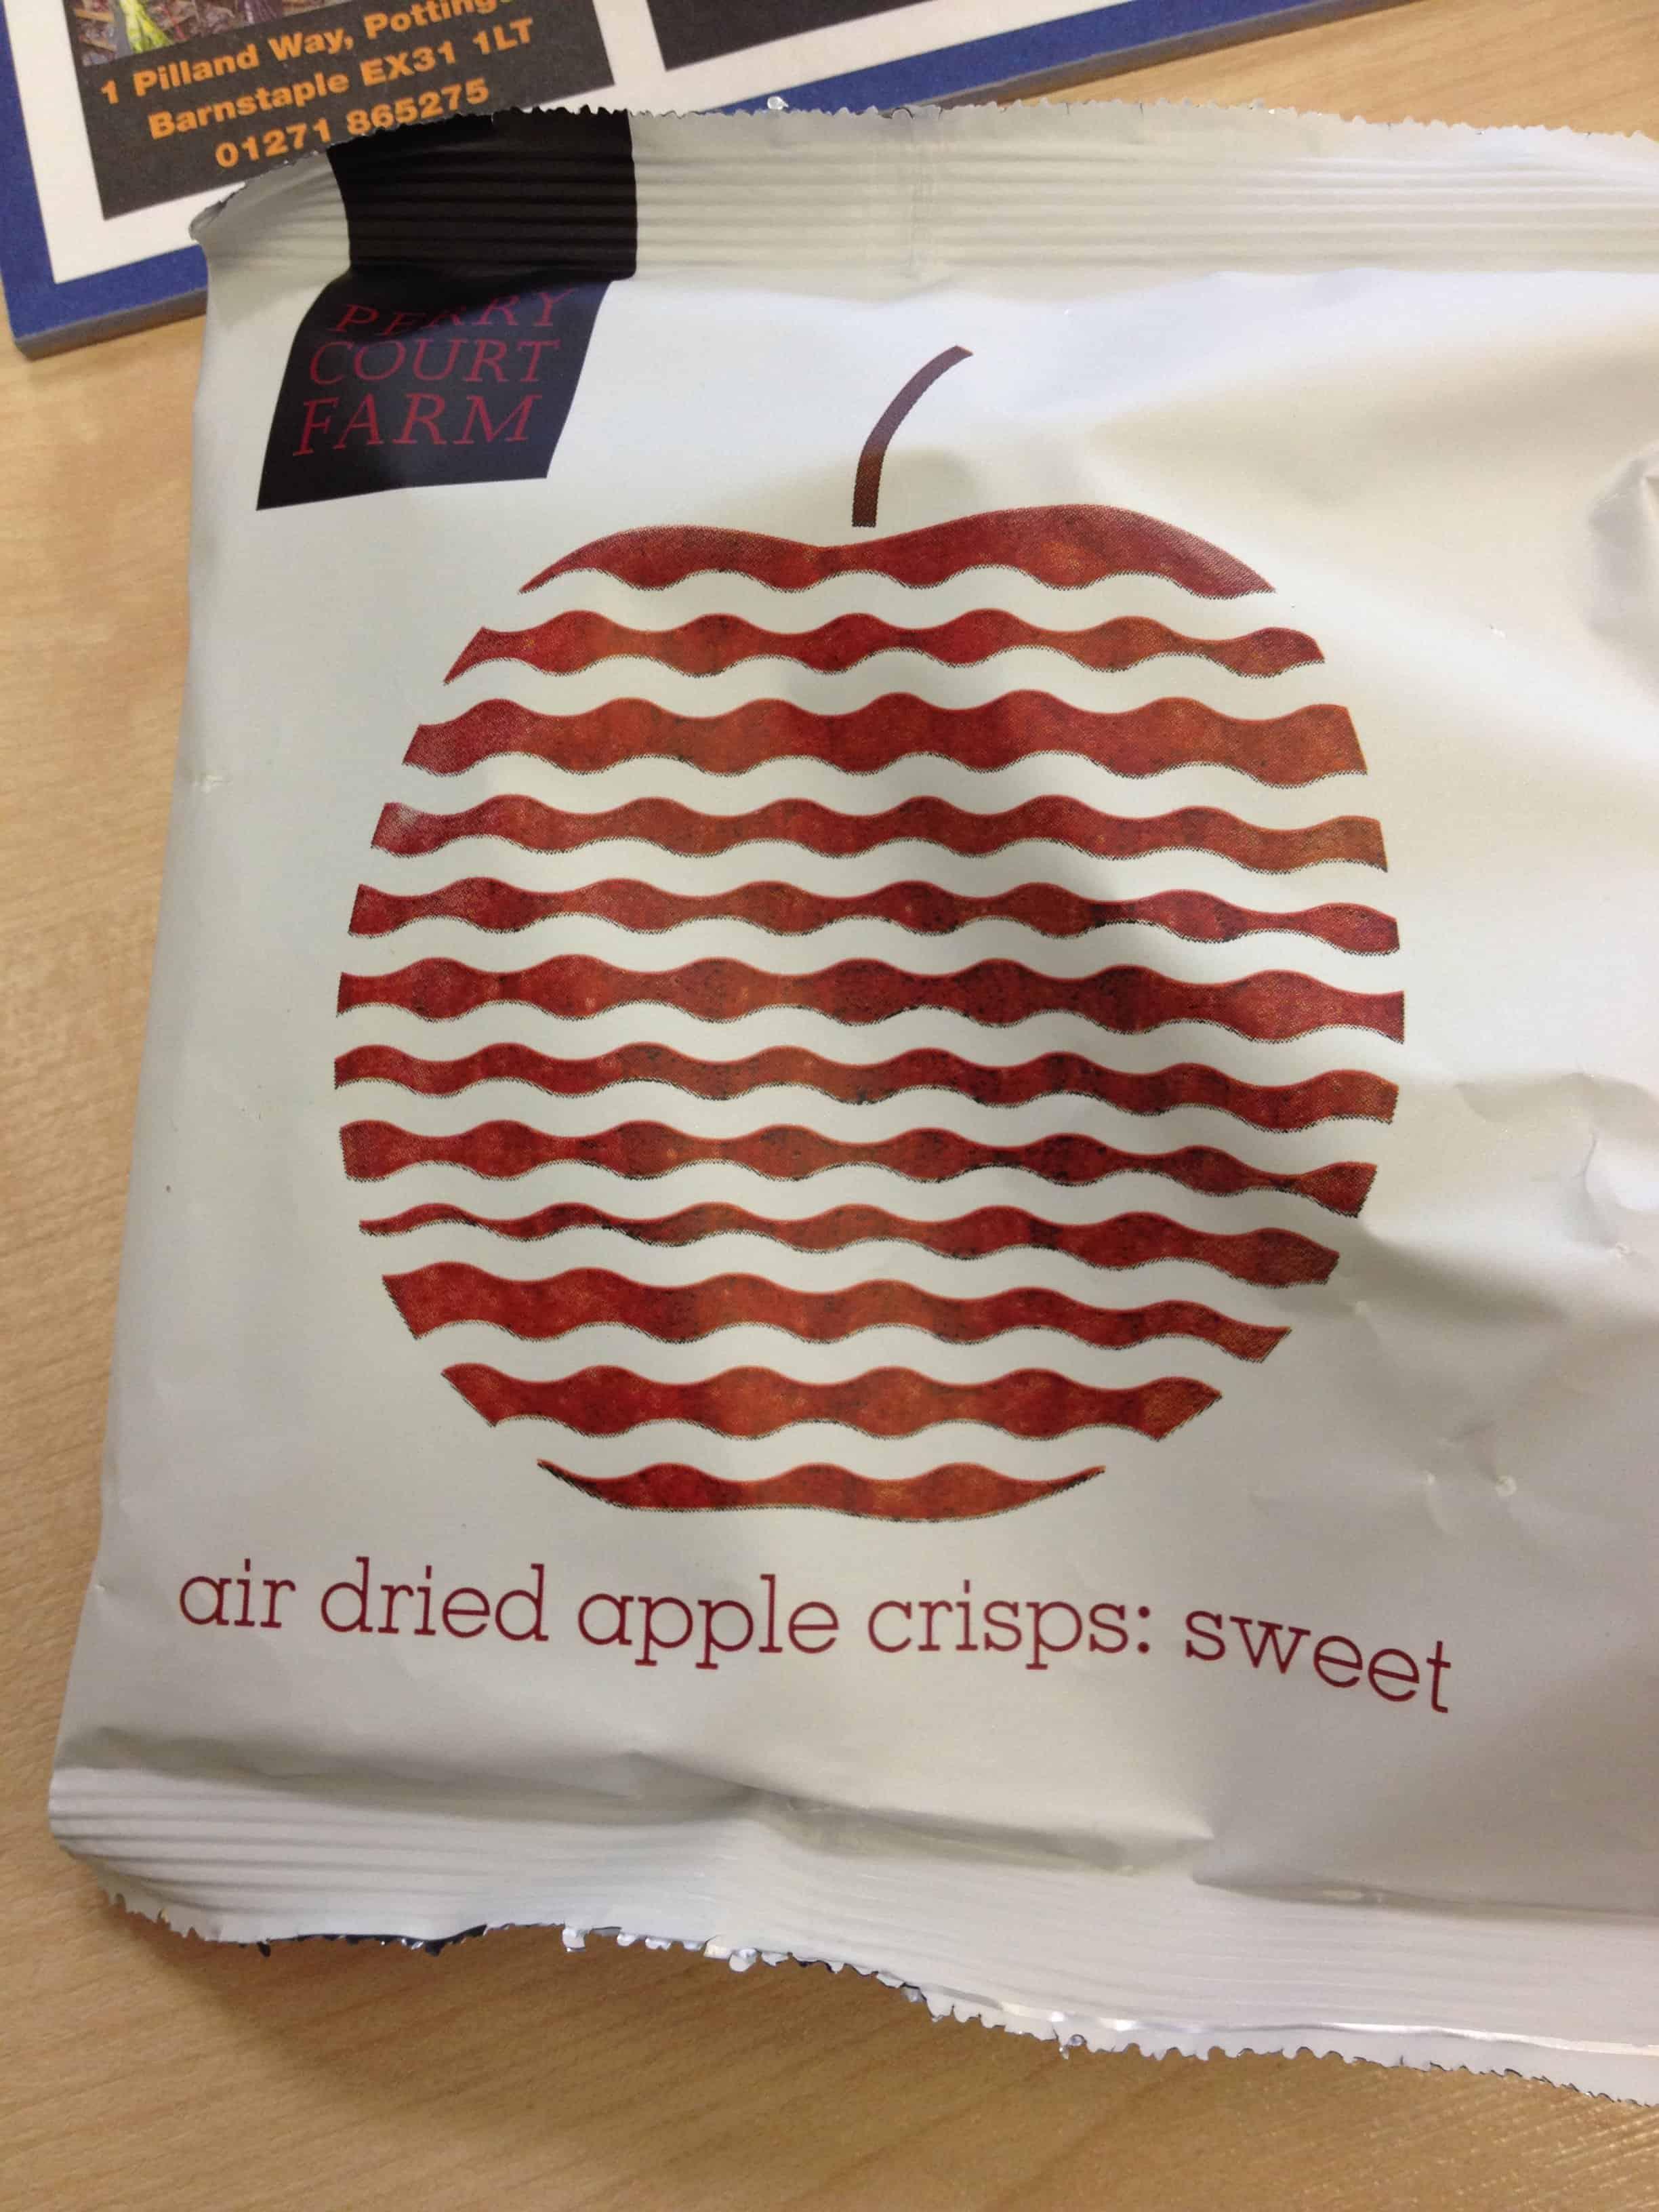 Sweet crisps? Madness!